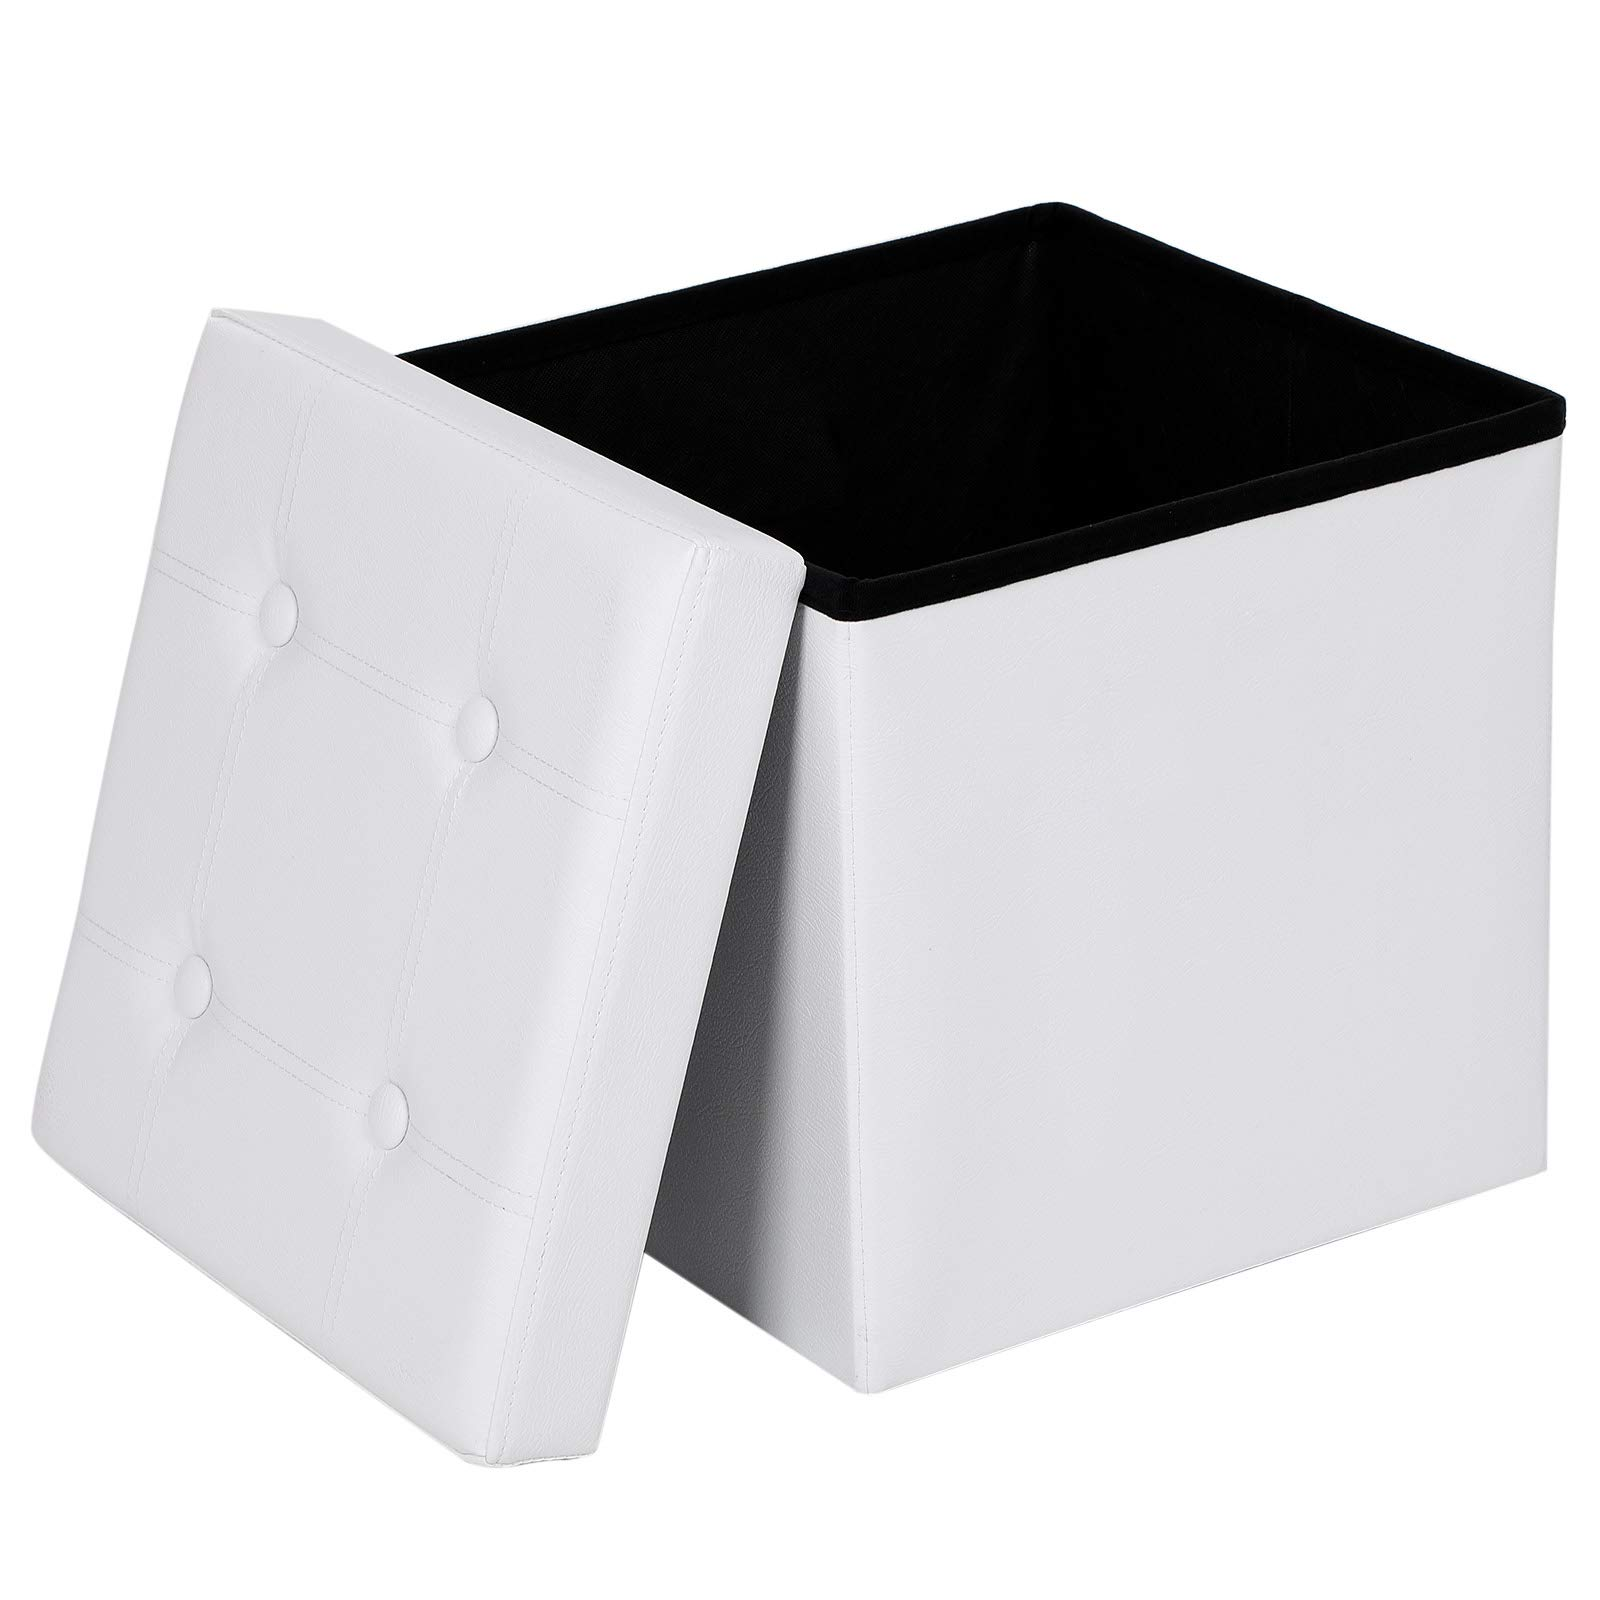 SONGMICS Baúl Puff Taburete de almacenaje Plegable 38 x 38 x 38 cm Carga máxima de